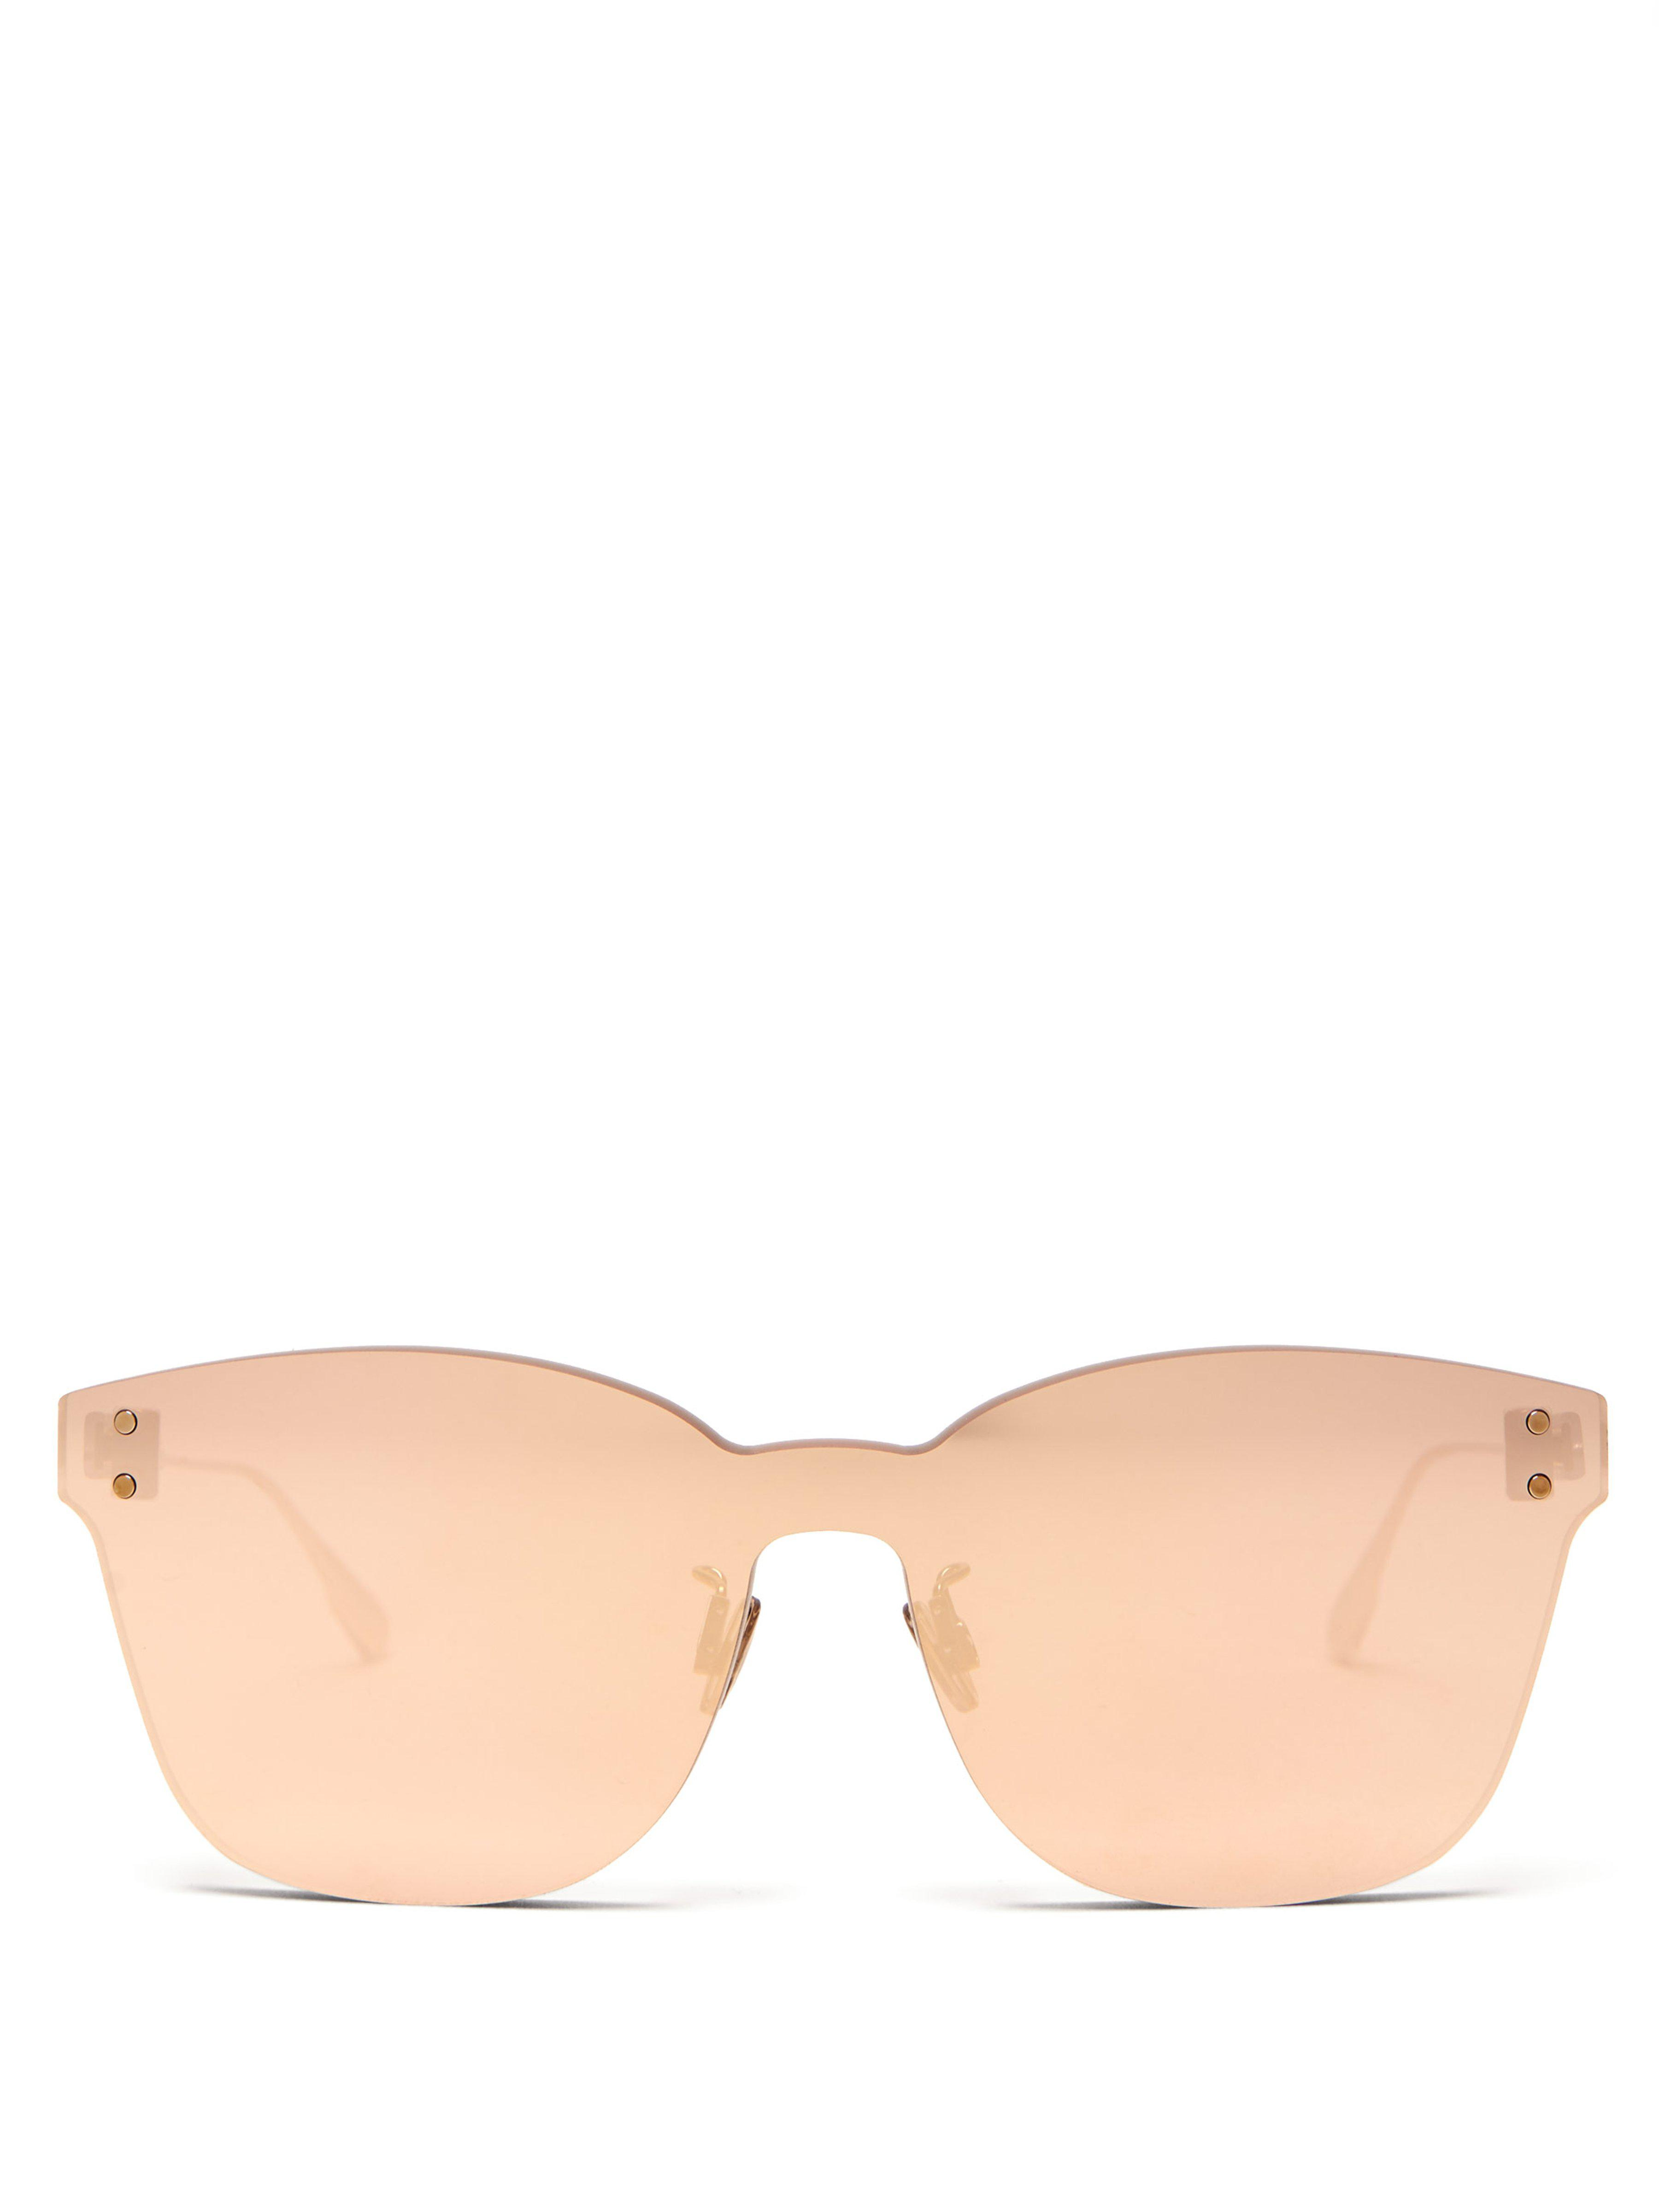 b7f3f14b385b Dior Diorcolorquake2 Sunglasses in Metallic - Lyst